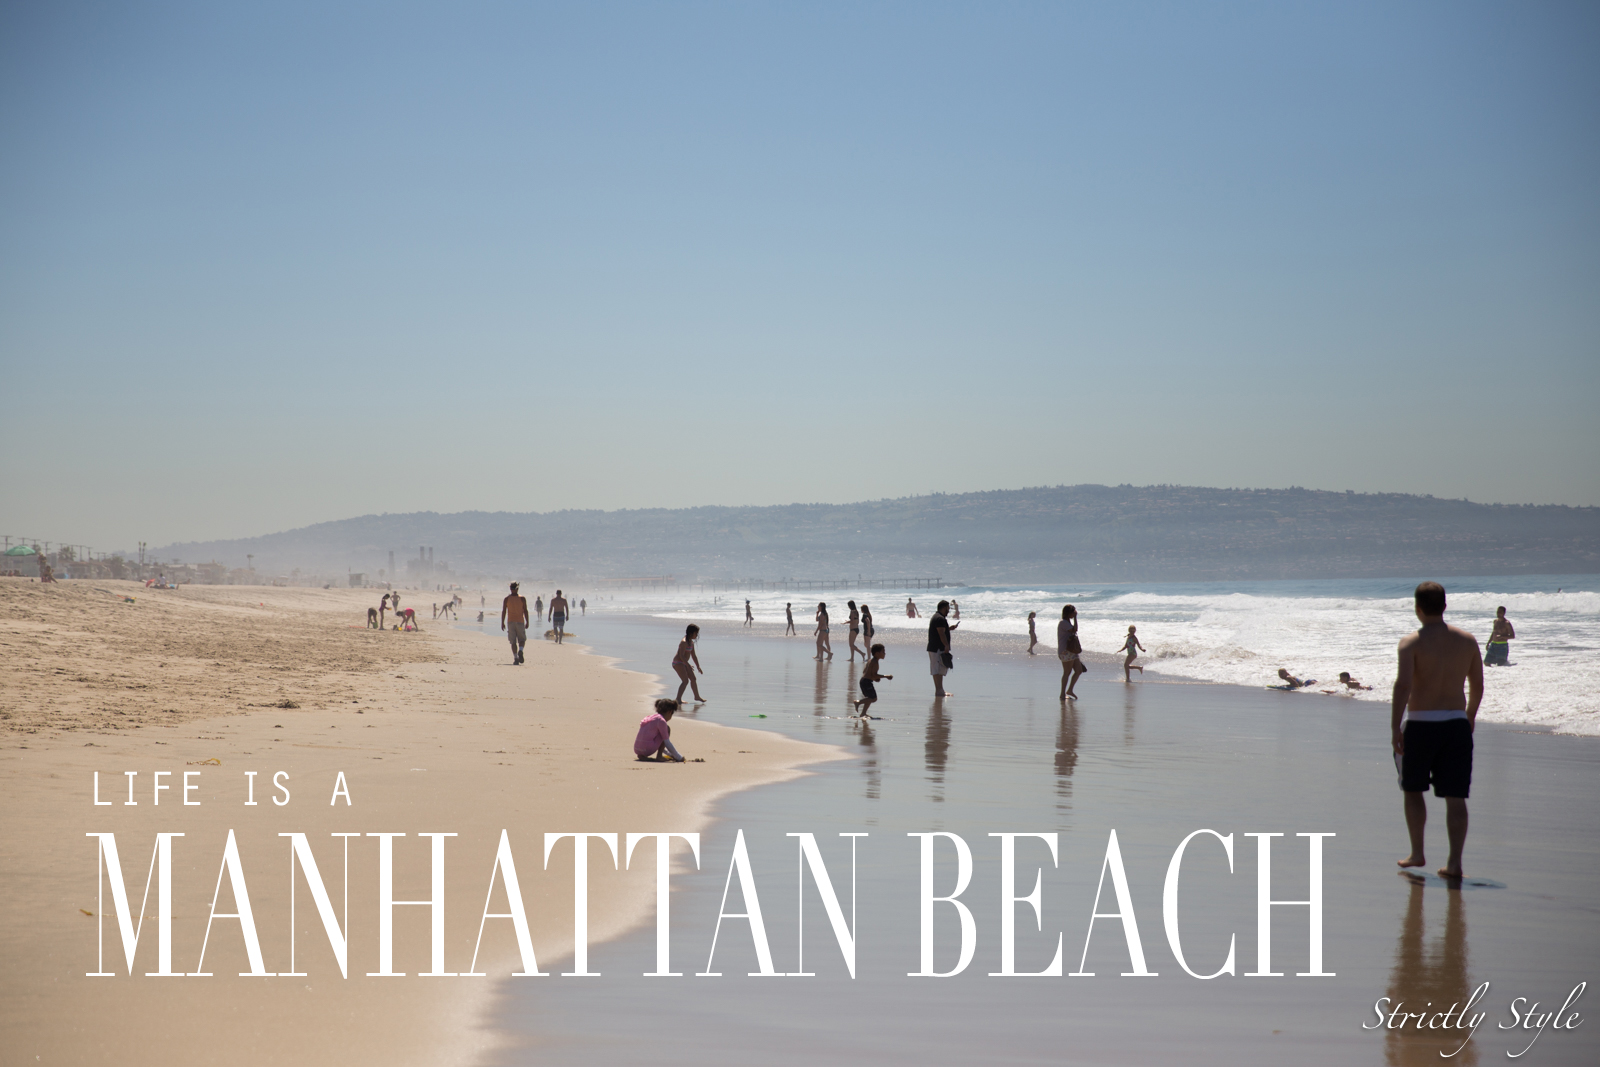 manhattan beach day-8663 TEXT